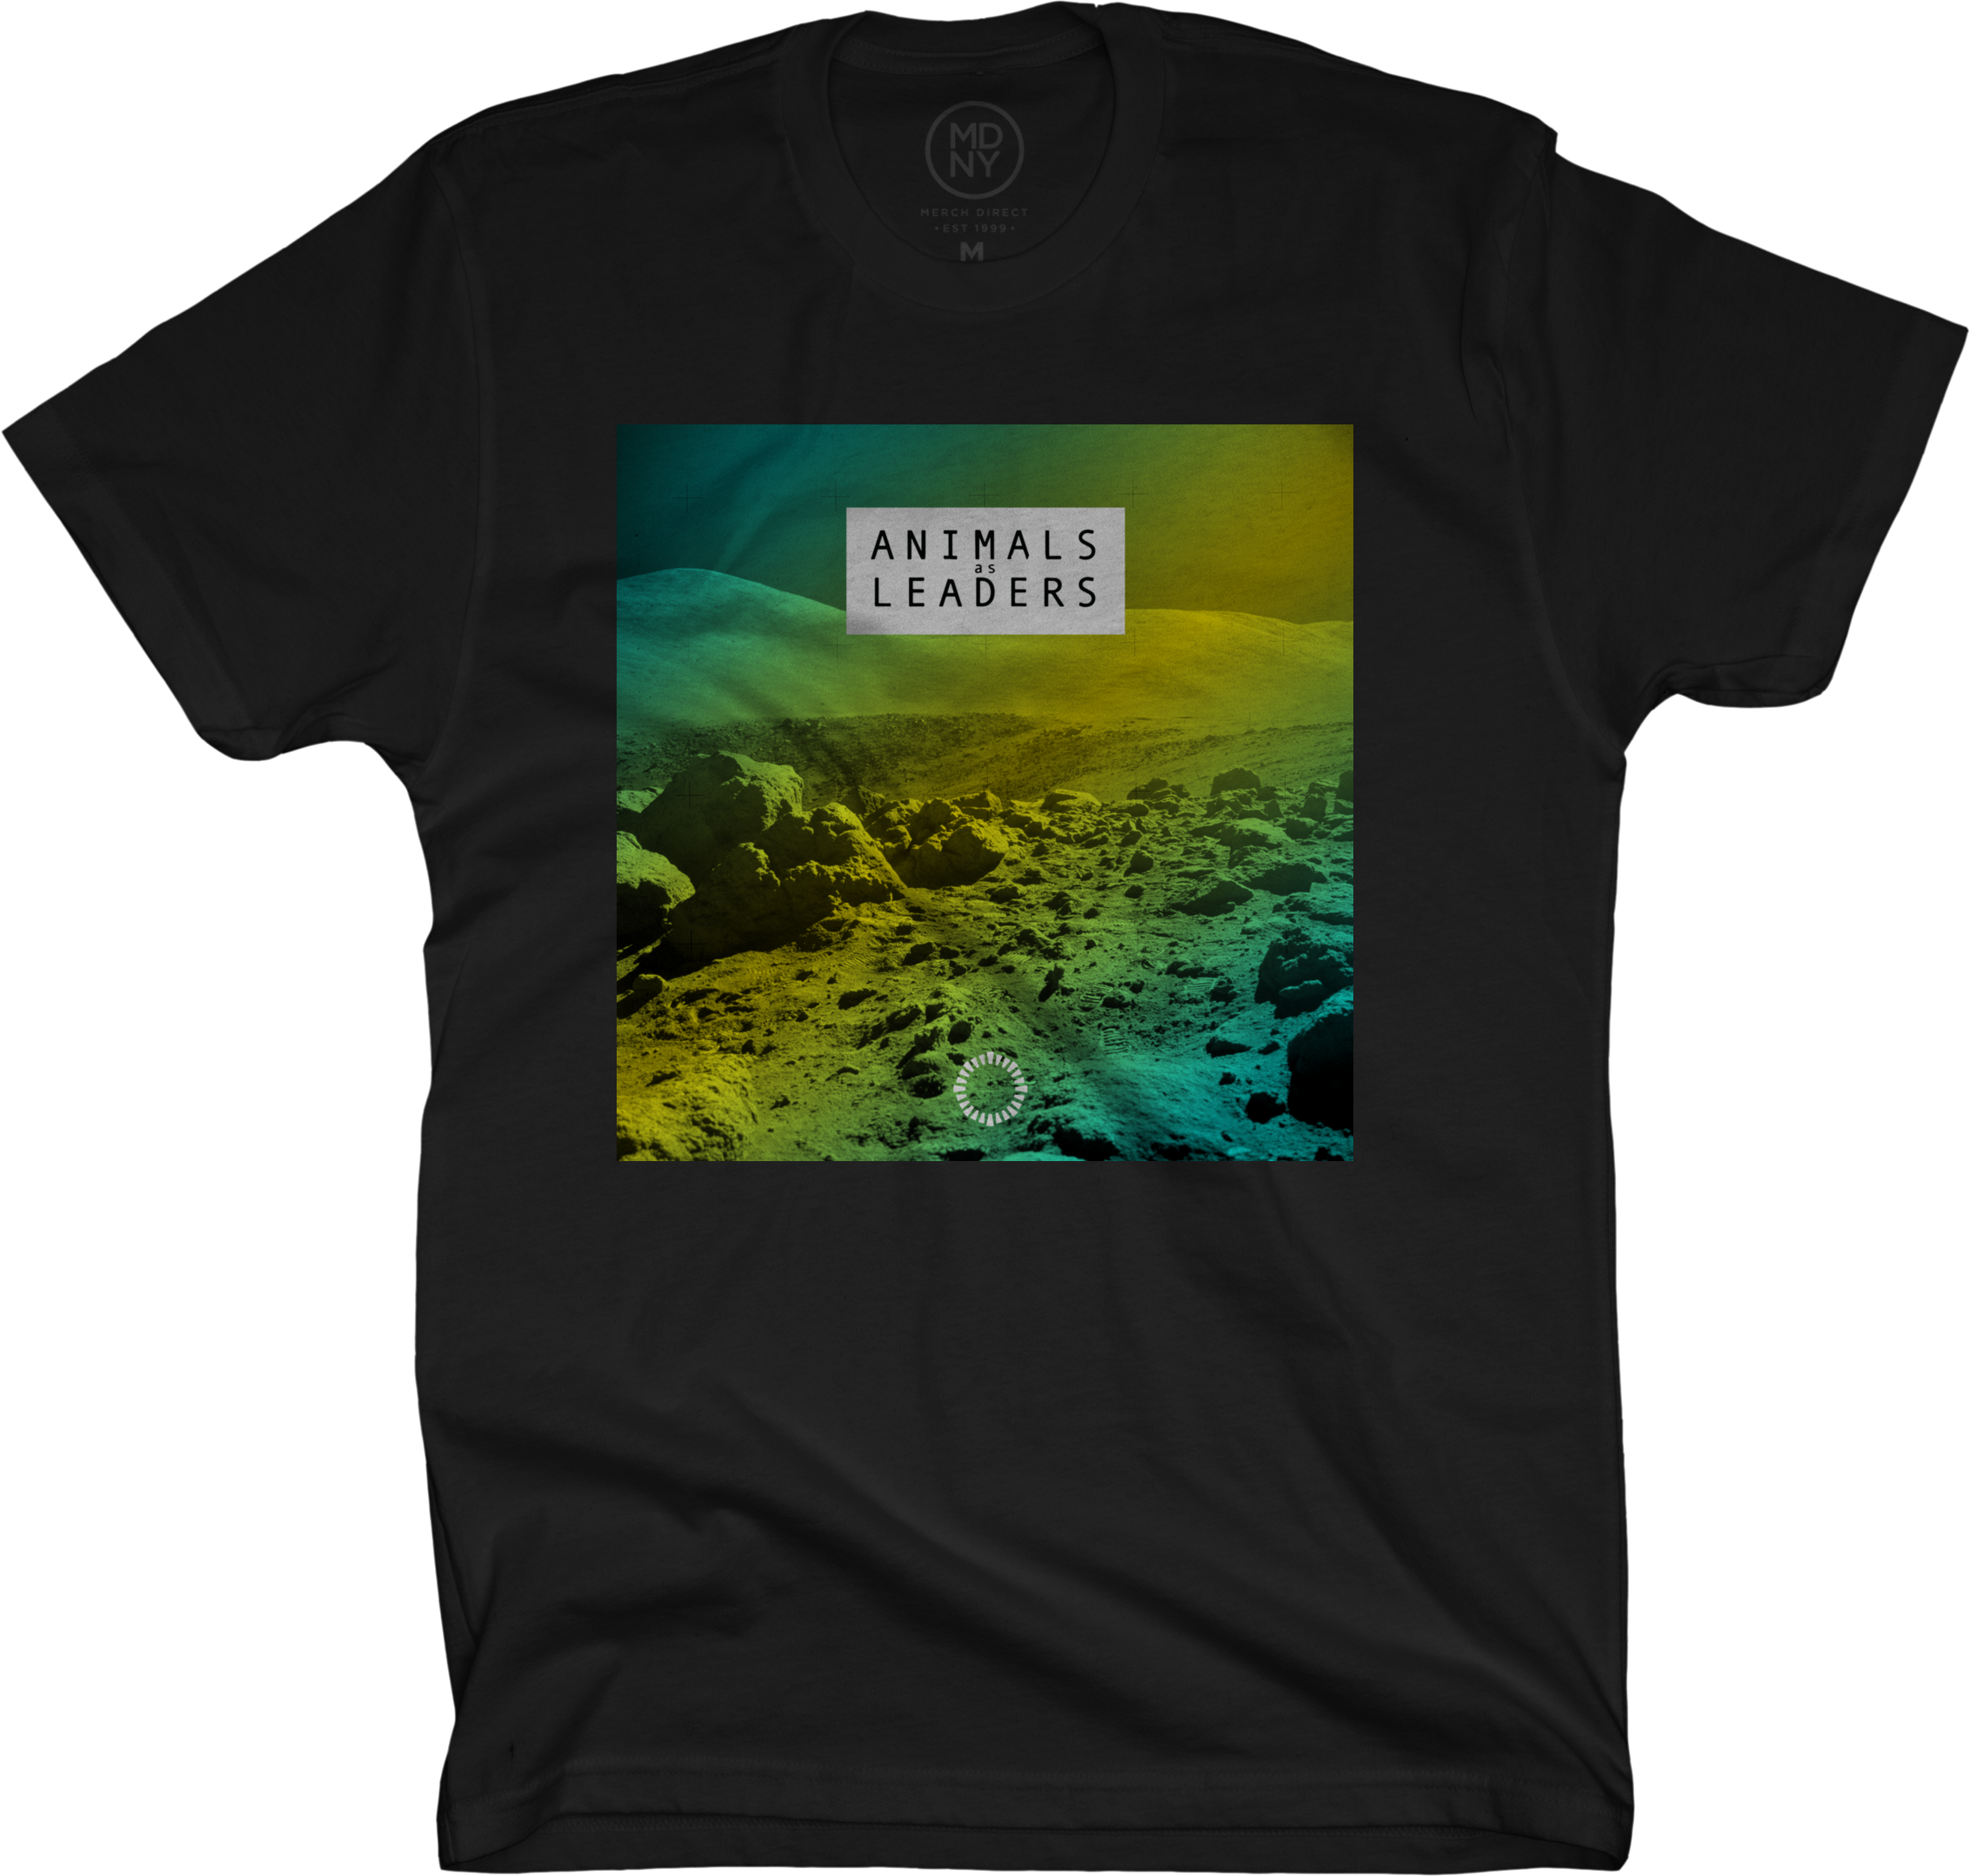 Mars on Black T-Shirt